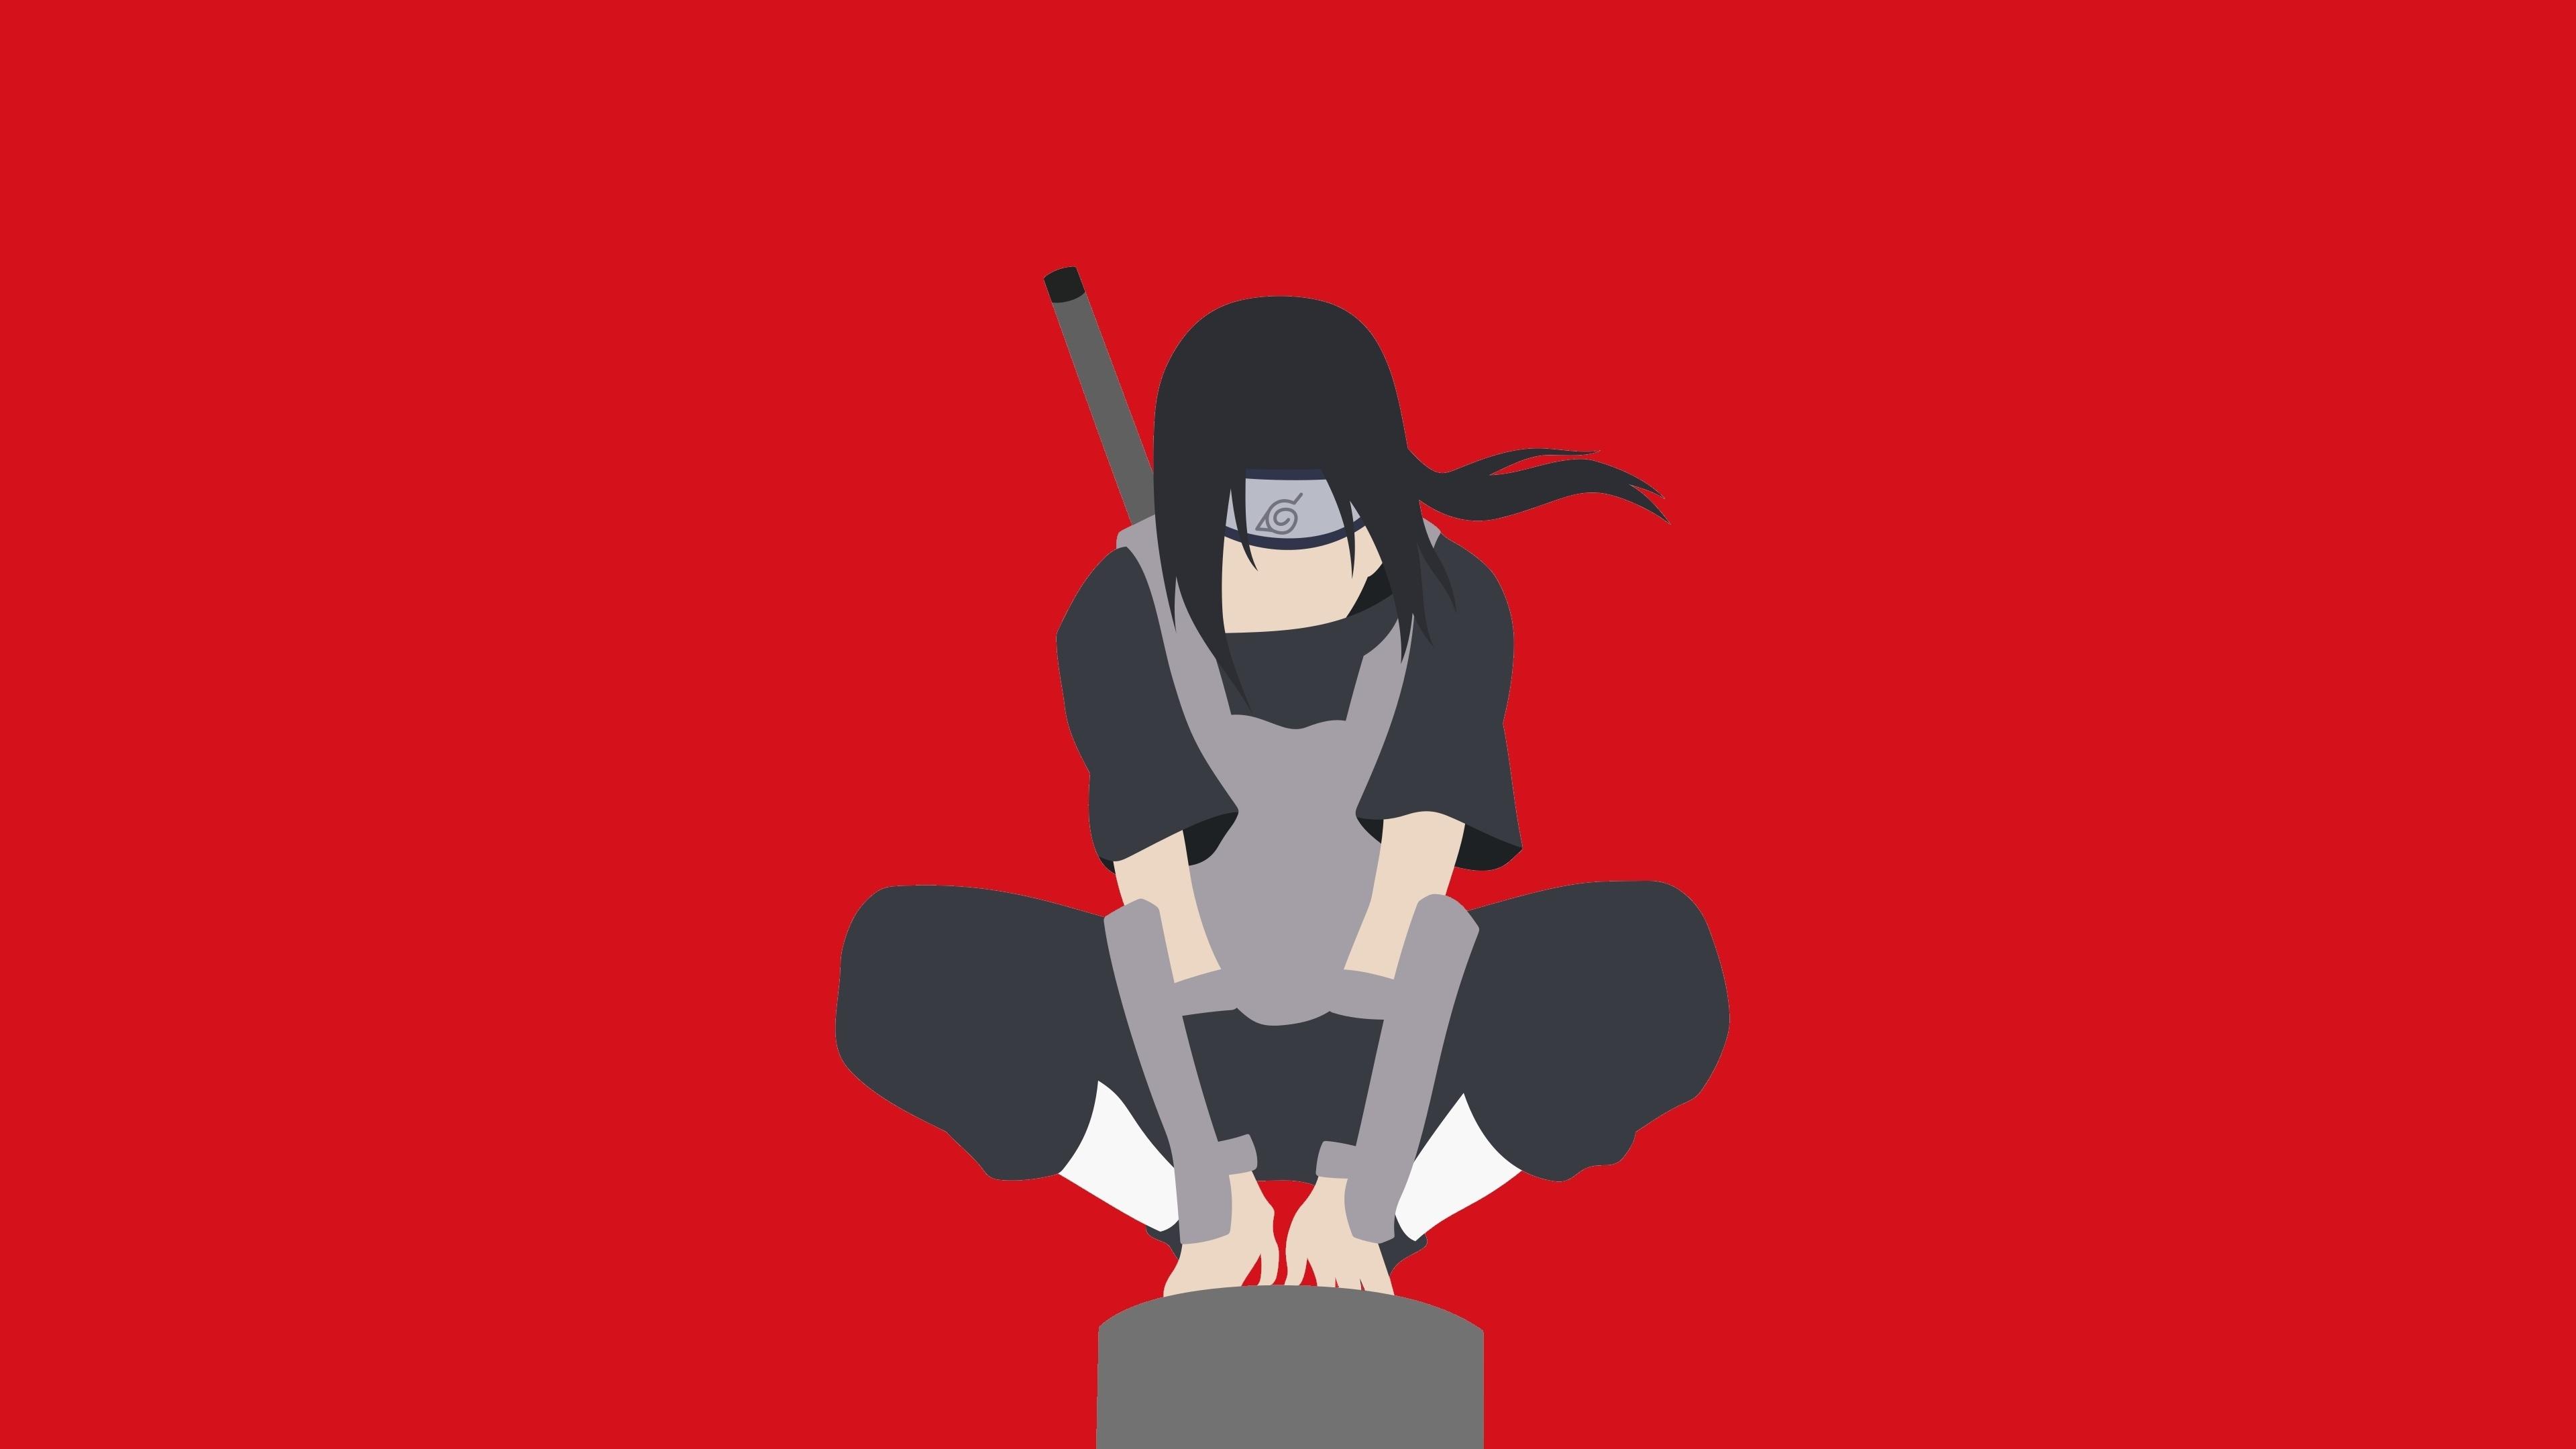 Minimal, Warrior, Naruto, Itachi Uchiha, Wallpaper - Itachi Uchiha - HD Wallpaper